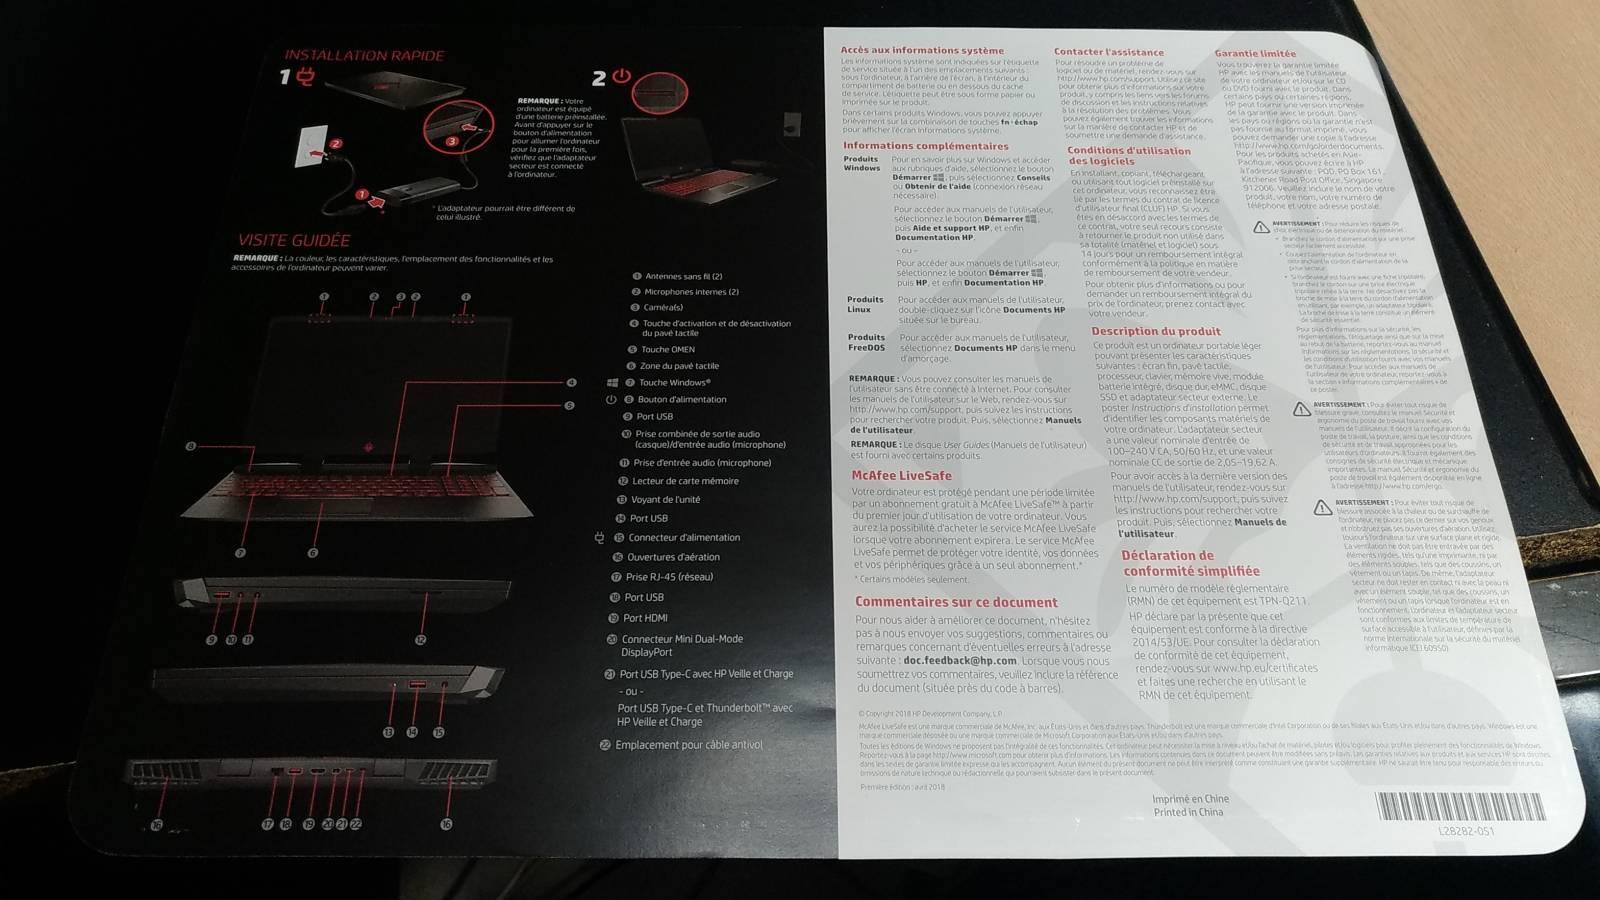 P_20181120_112321_vHDR_Auto.jpg